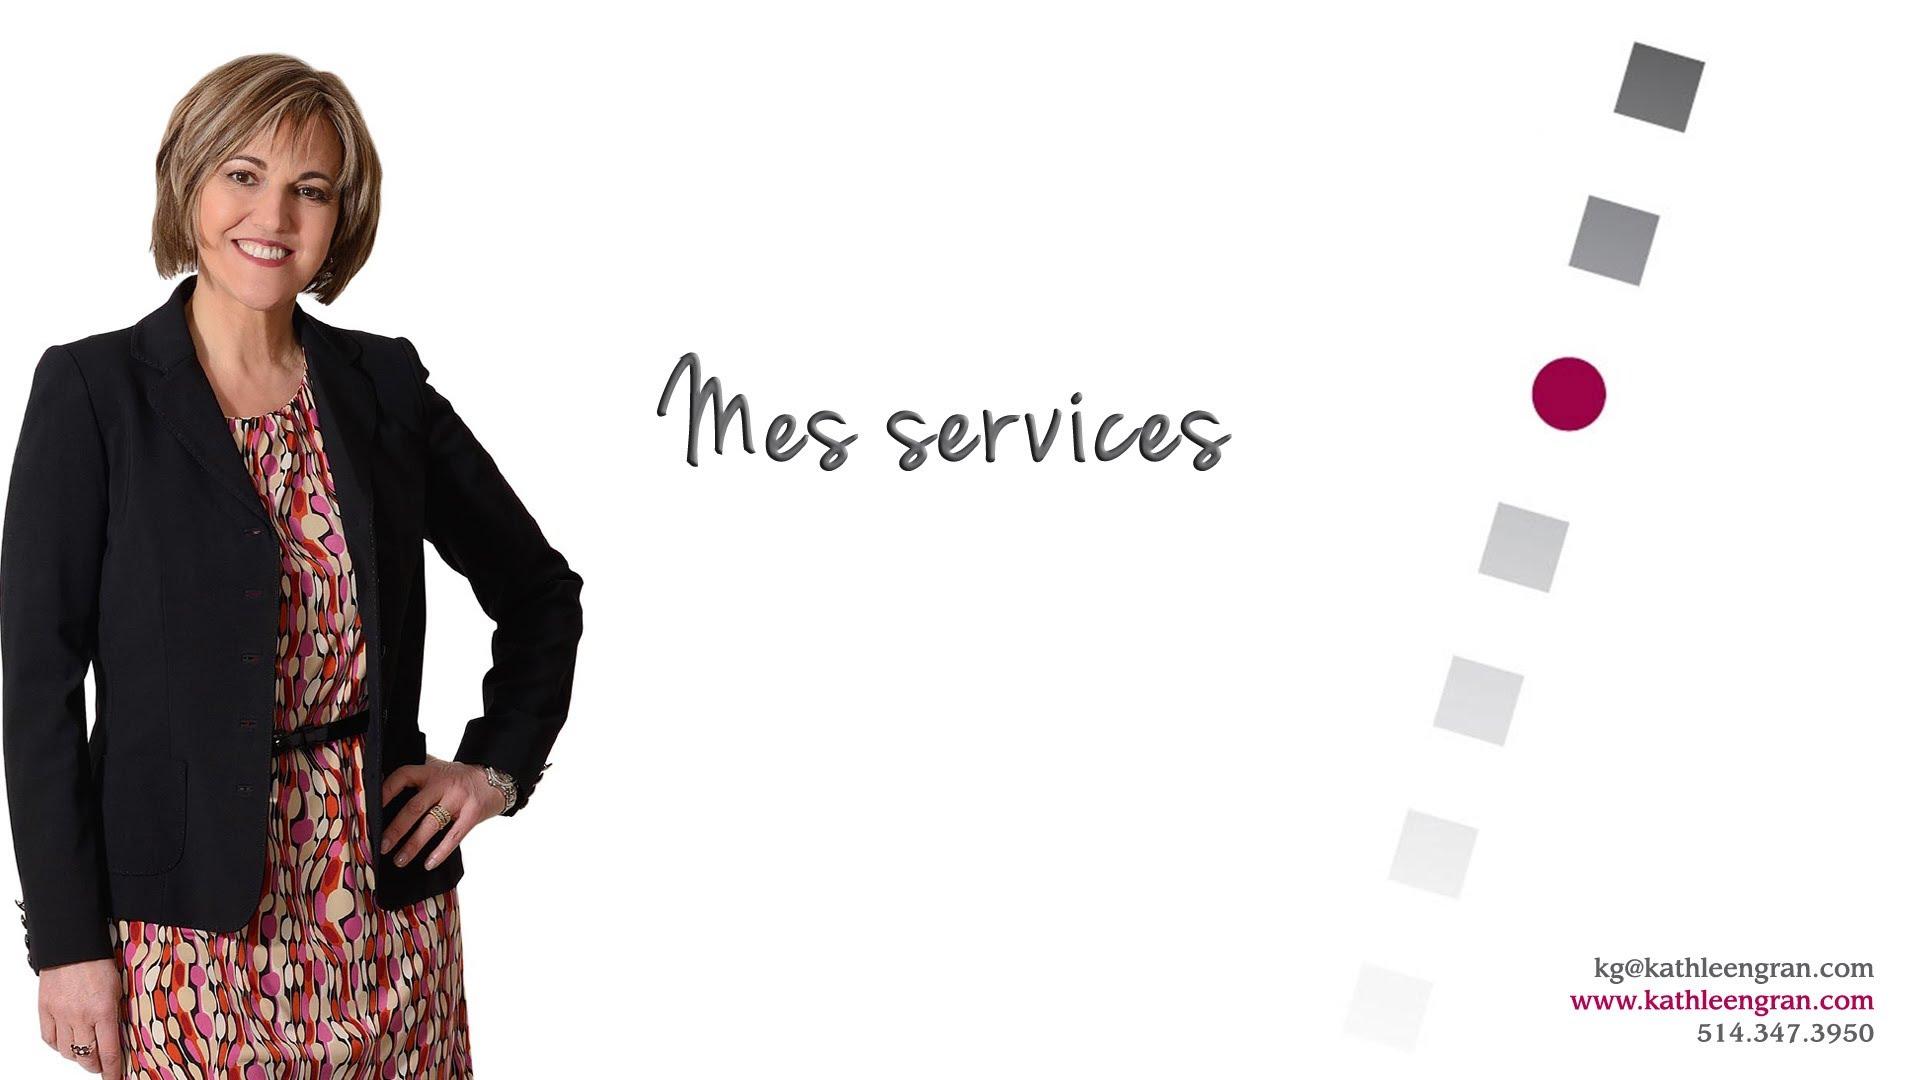 Services offerts par Kathleen Gran, spécialiste en branding